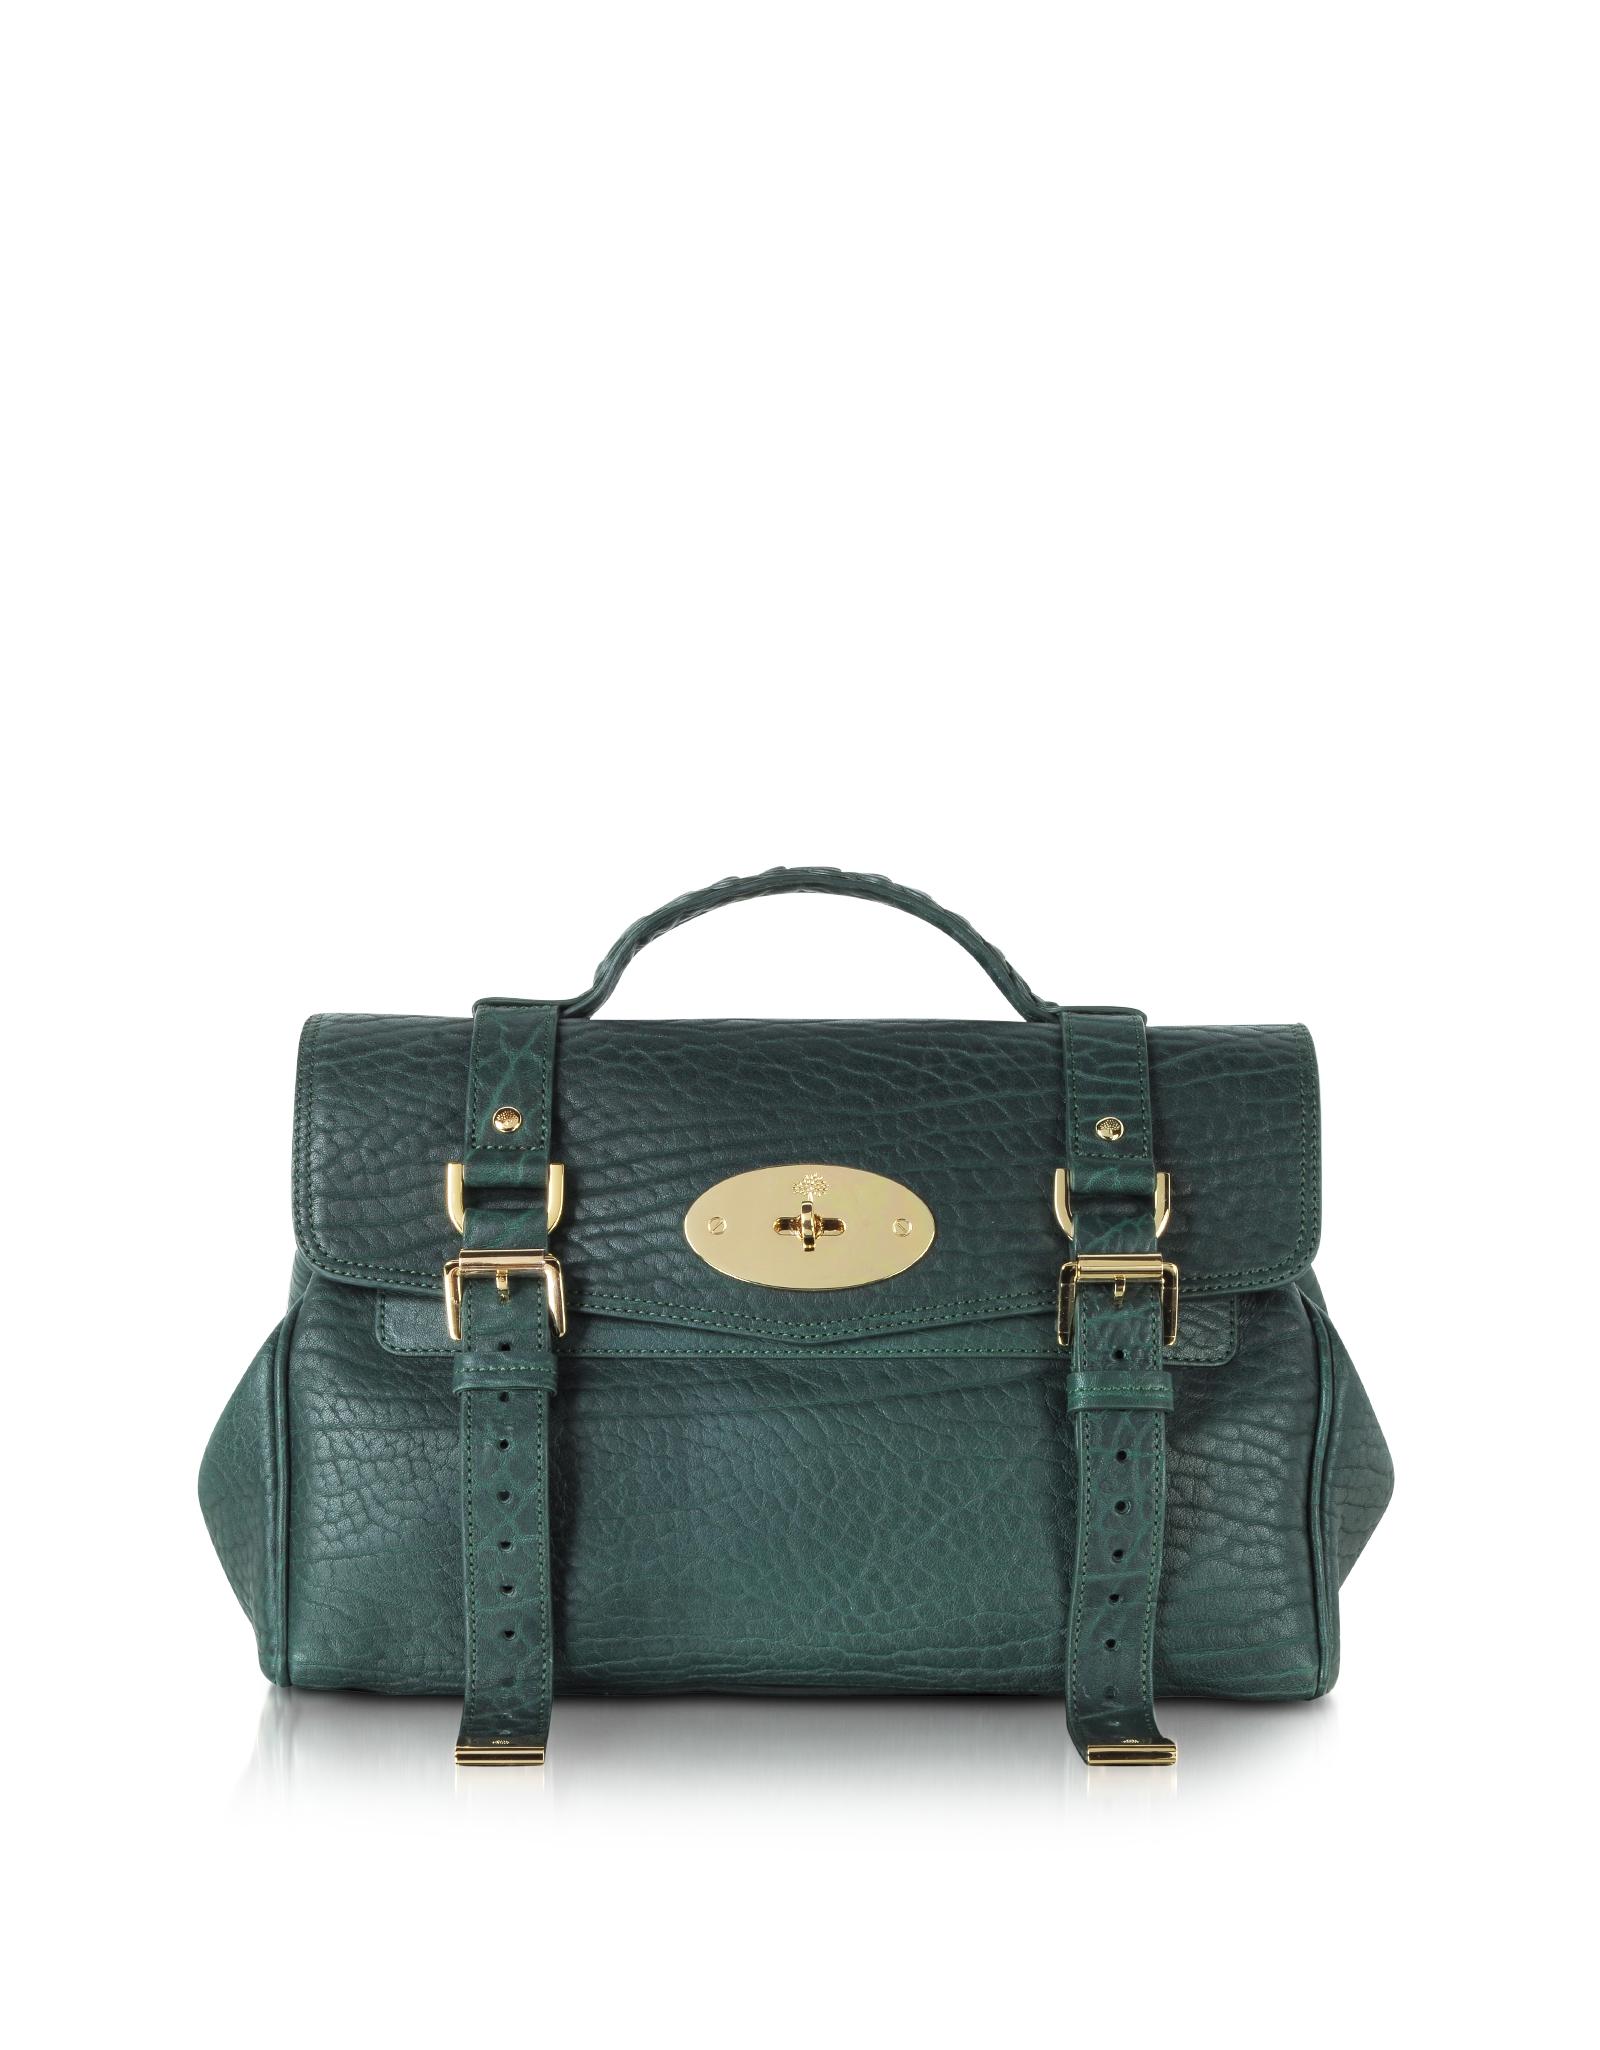 Mulberry Alexa Shrunken Calf Leather Satchel Bag in Green | Lyst